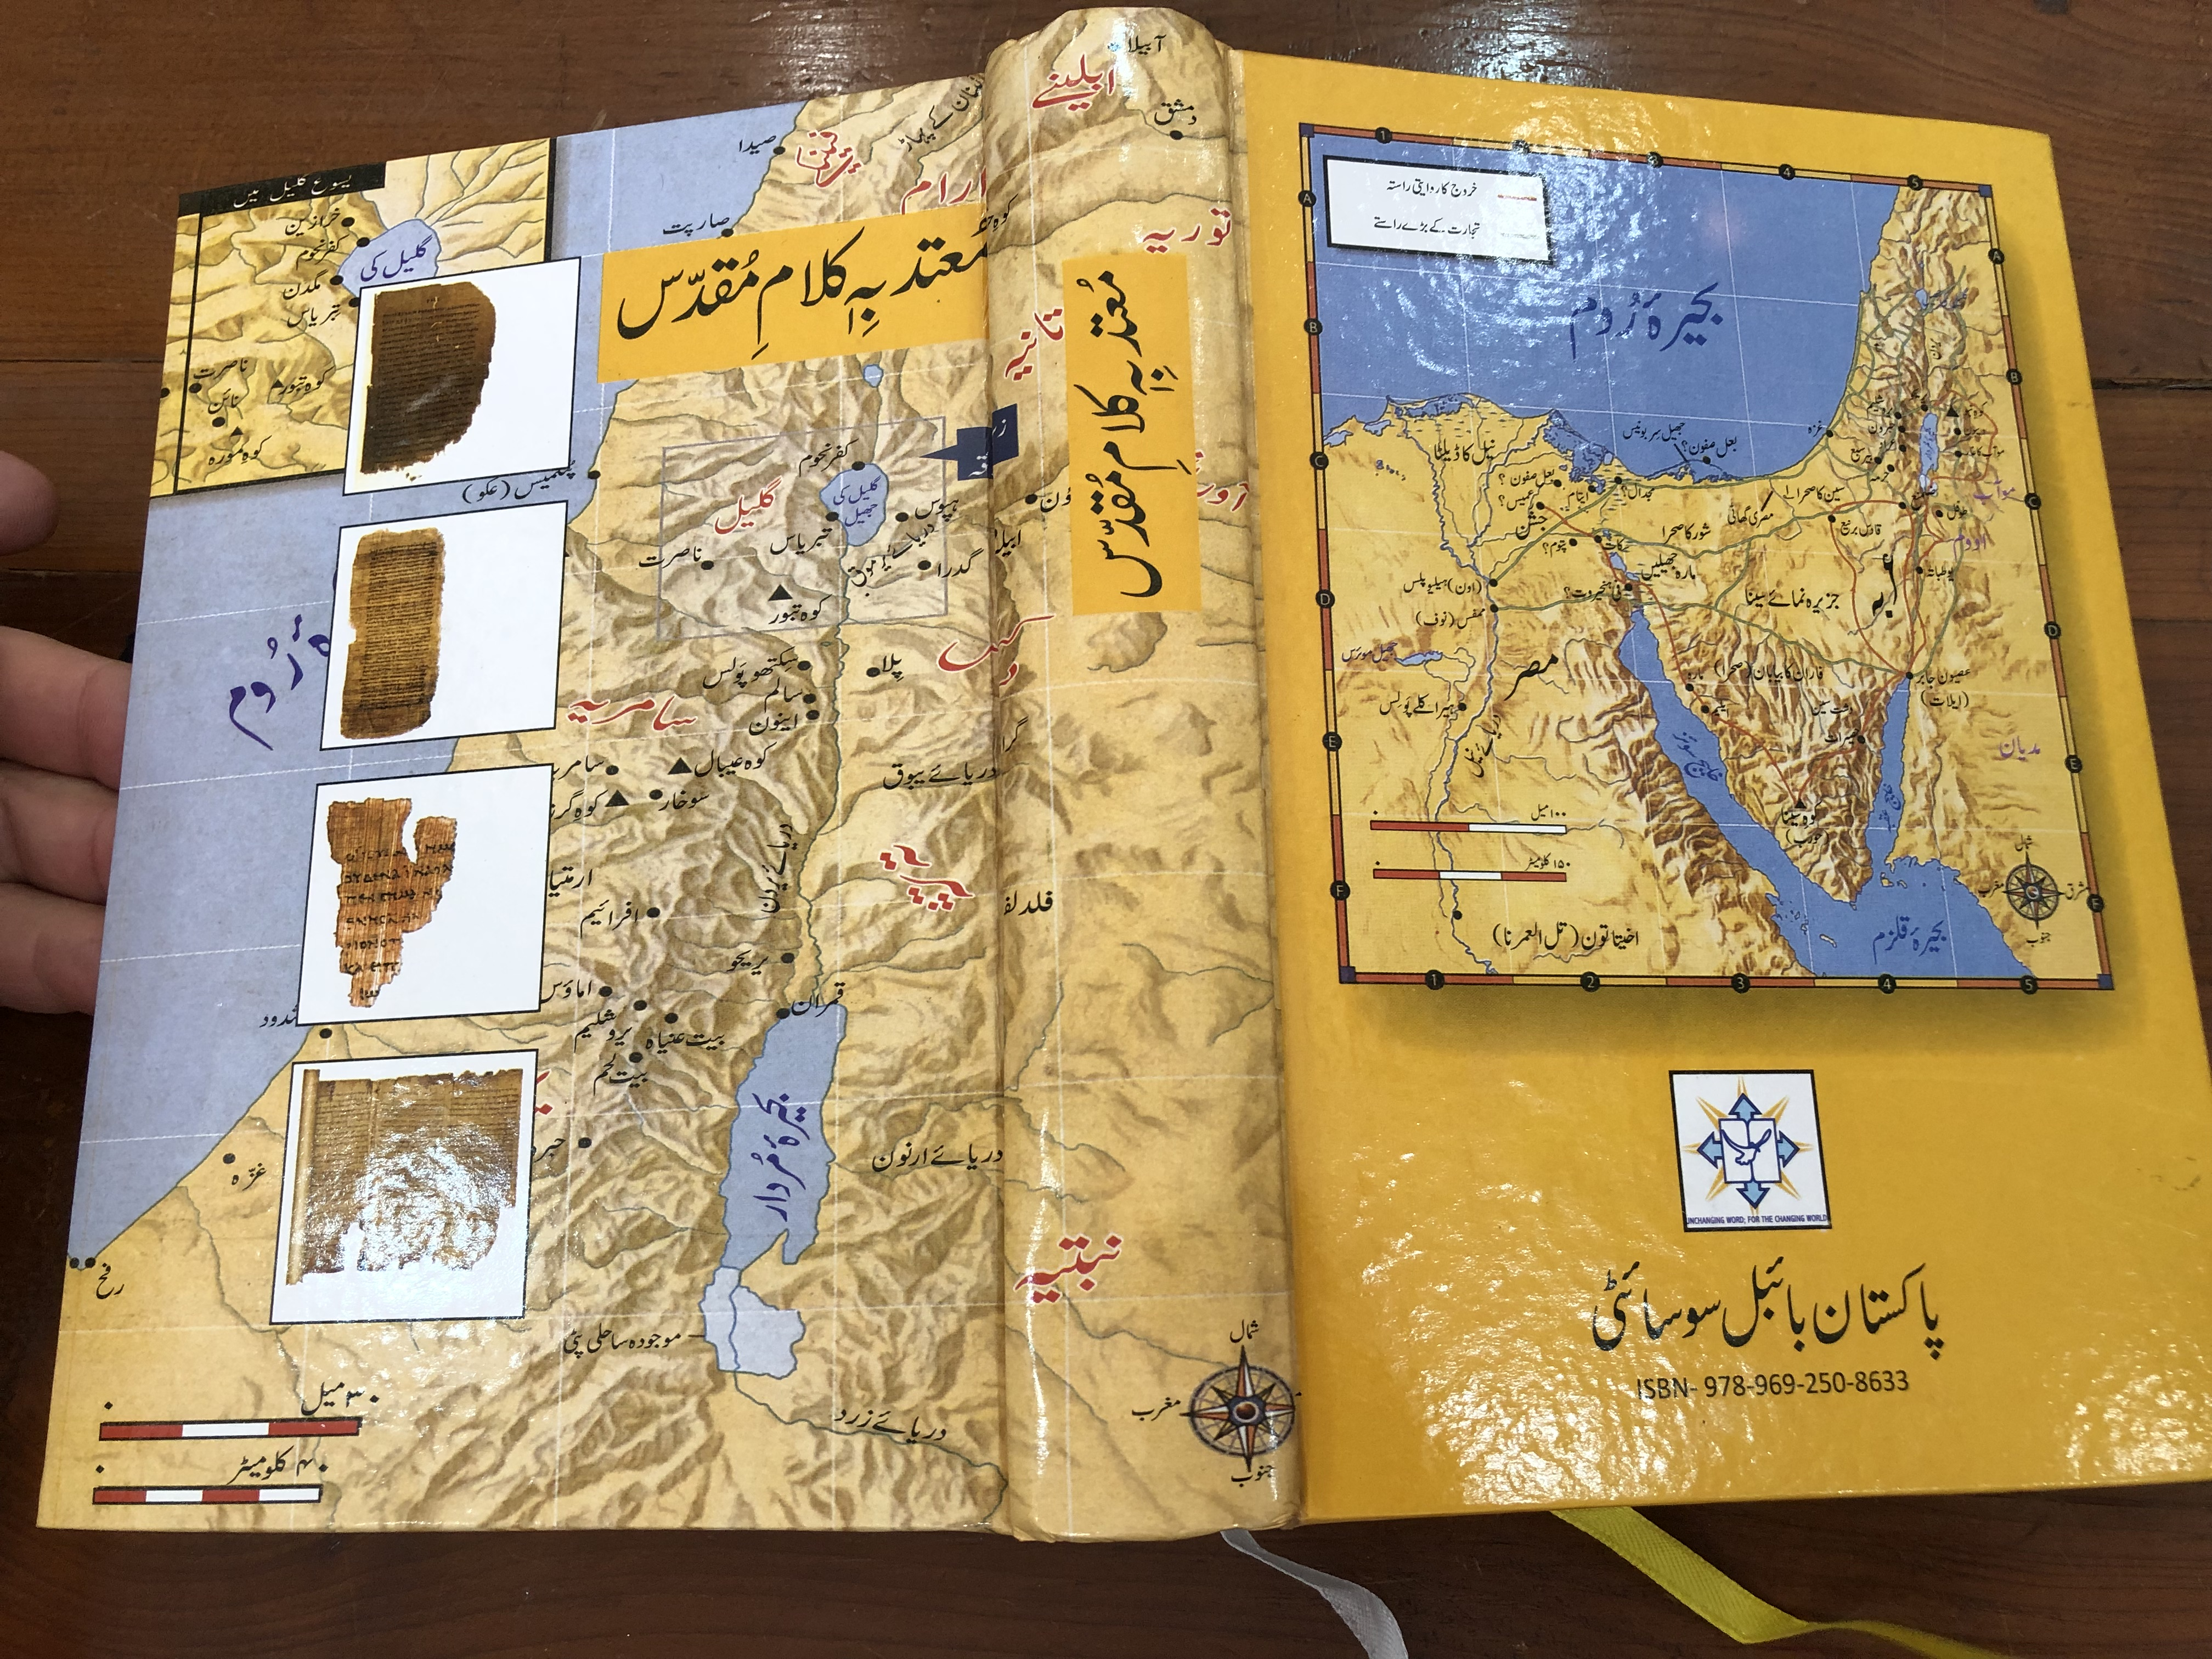 discover-the-bible-in-urdu-language-motdaba-kalam-e-muqadds-hardcover-2013-pakistan-bible-society-3-.jpg